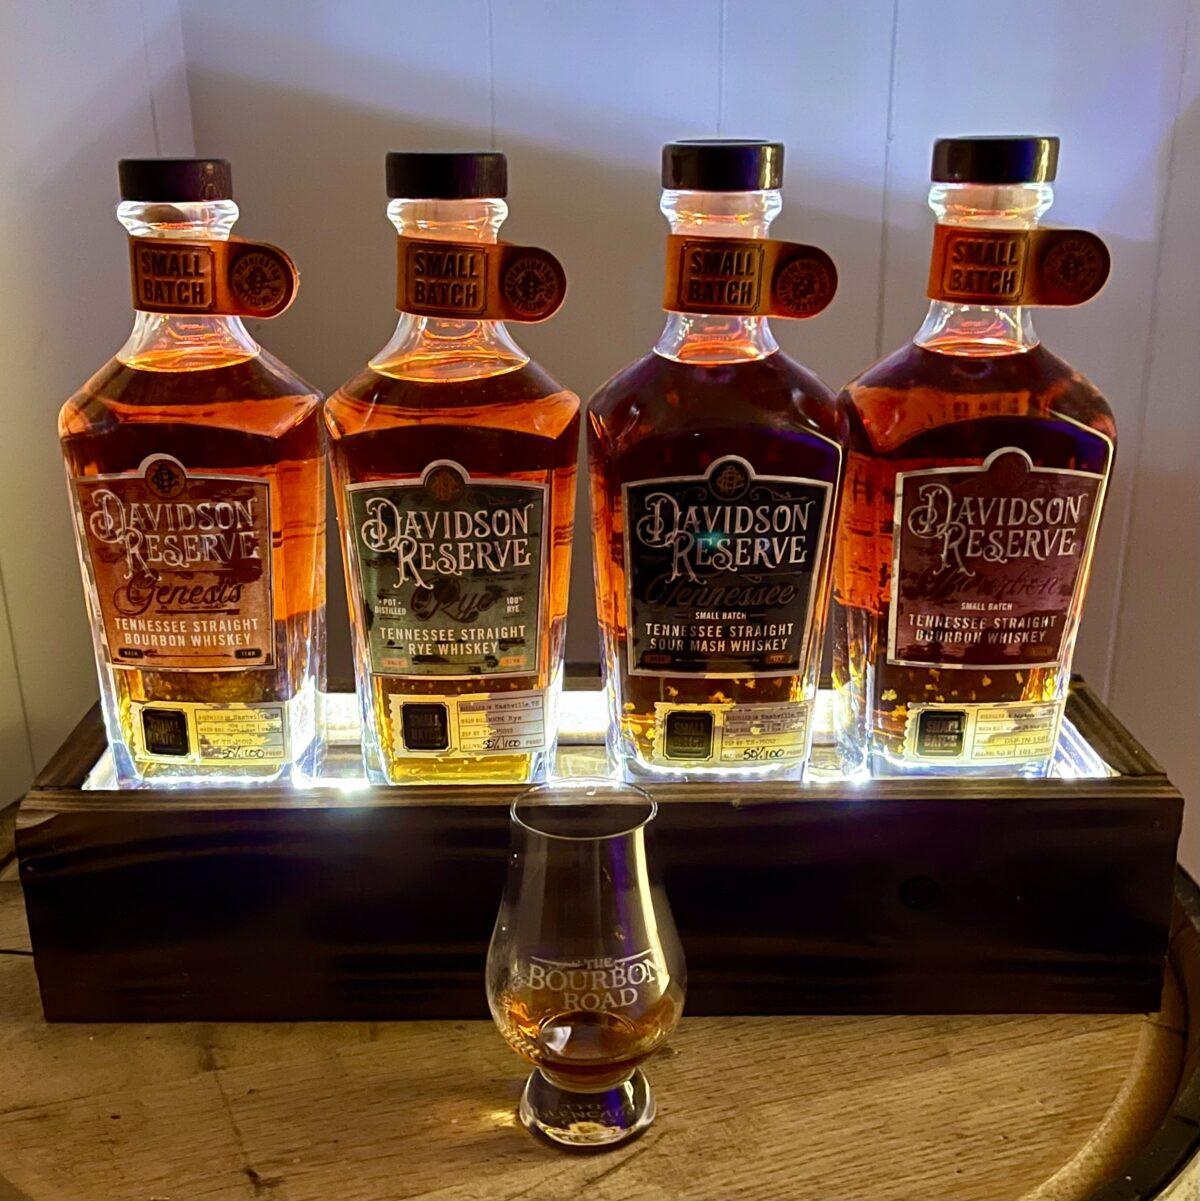 Davidson Reserve - Nashville's Pennington Distilling